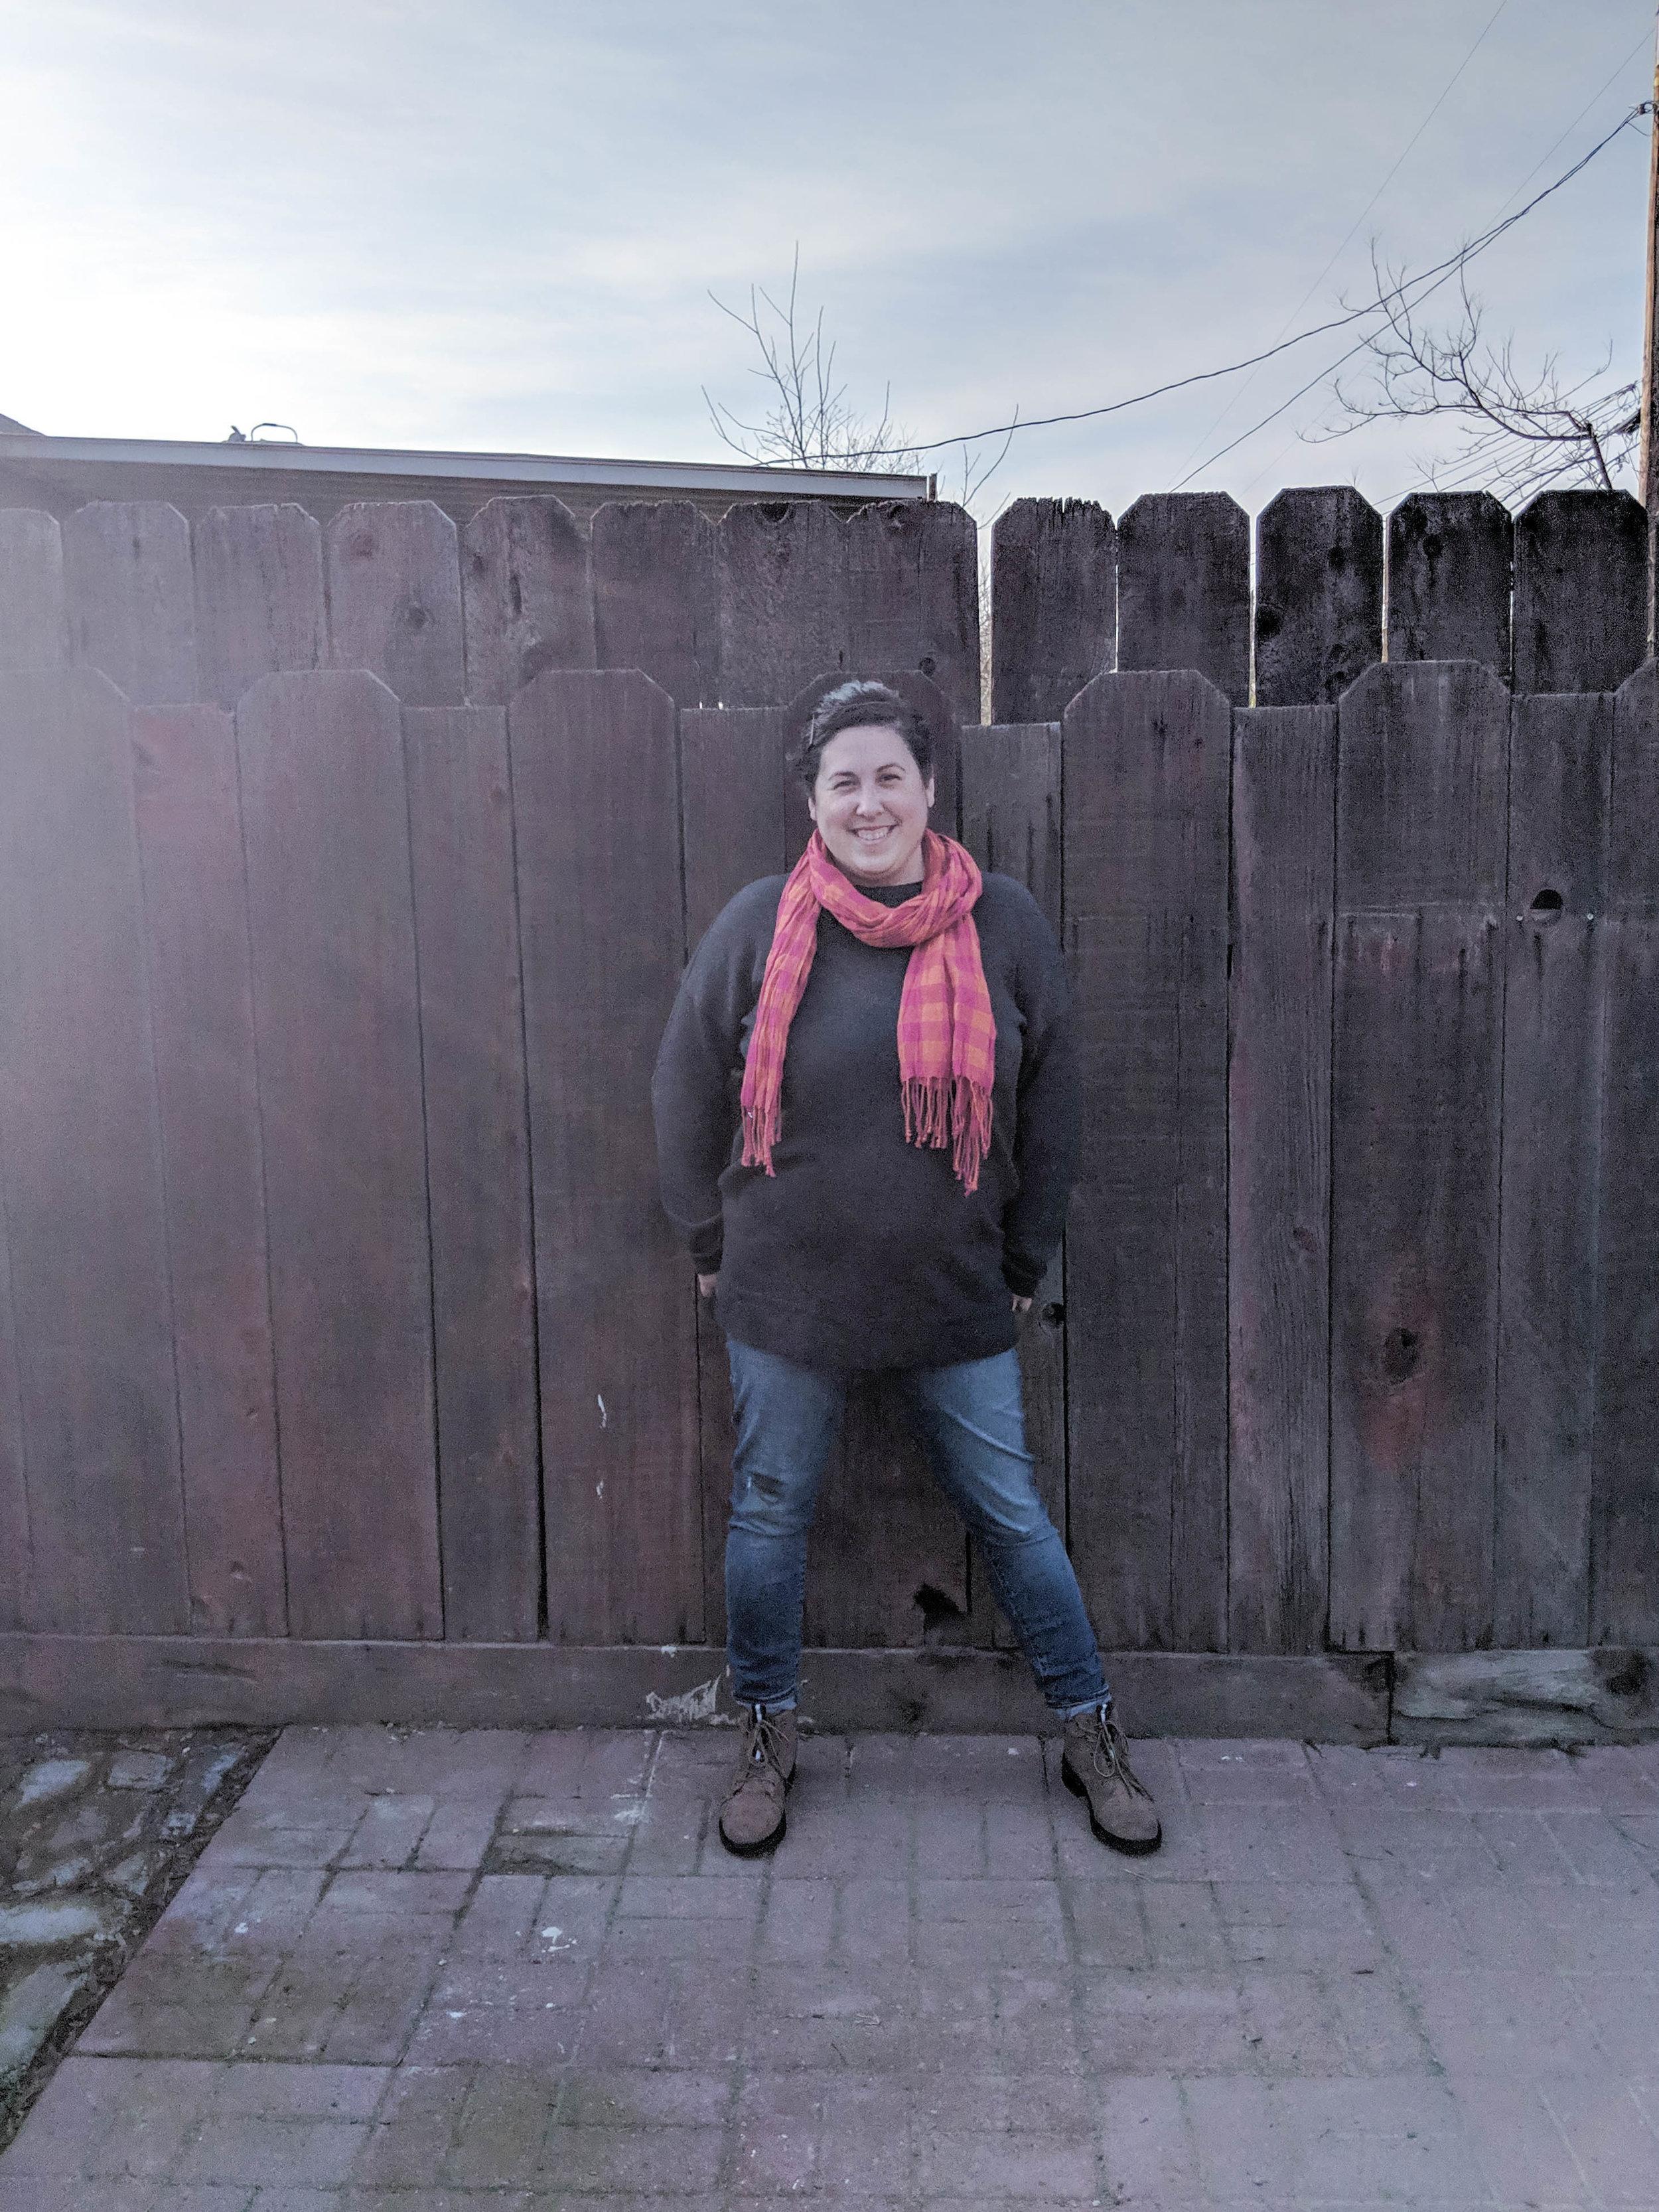 bri rinehart; hanford; photography; 2019; new year